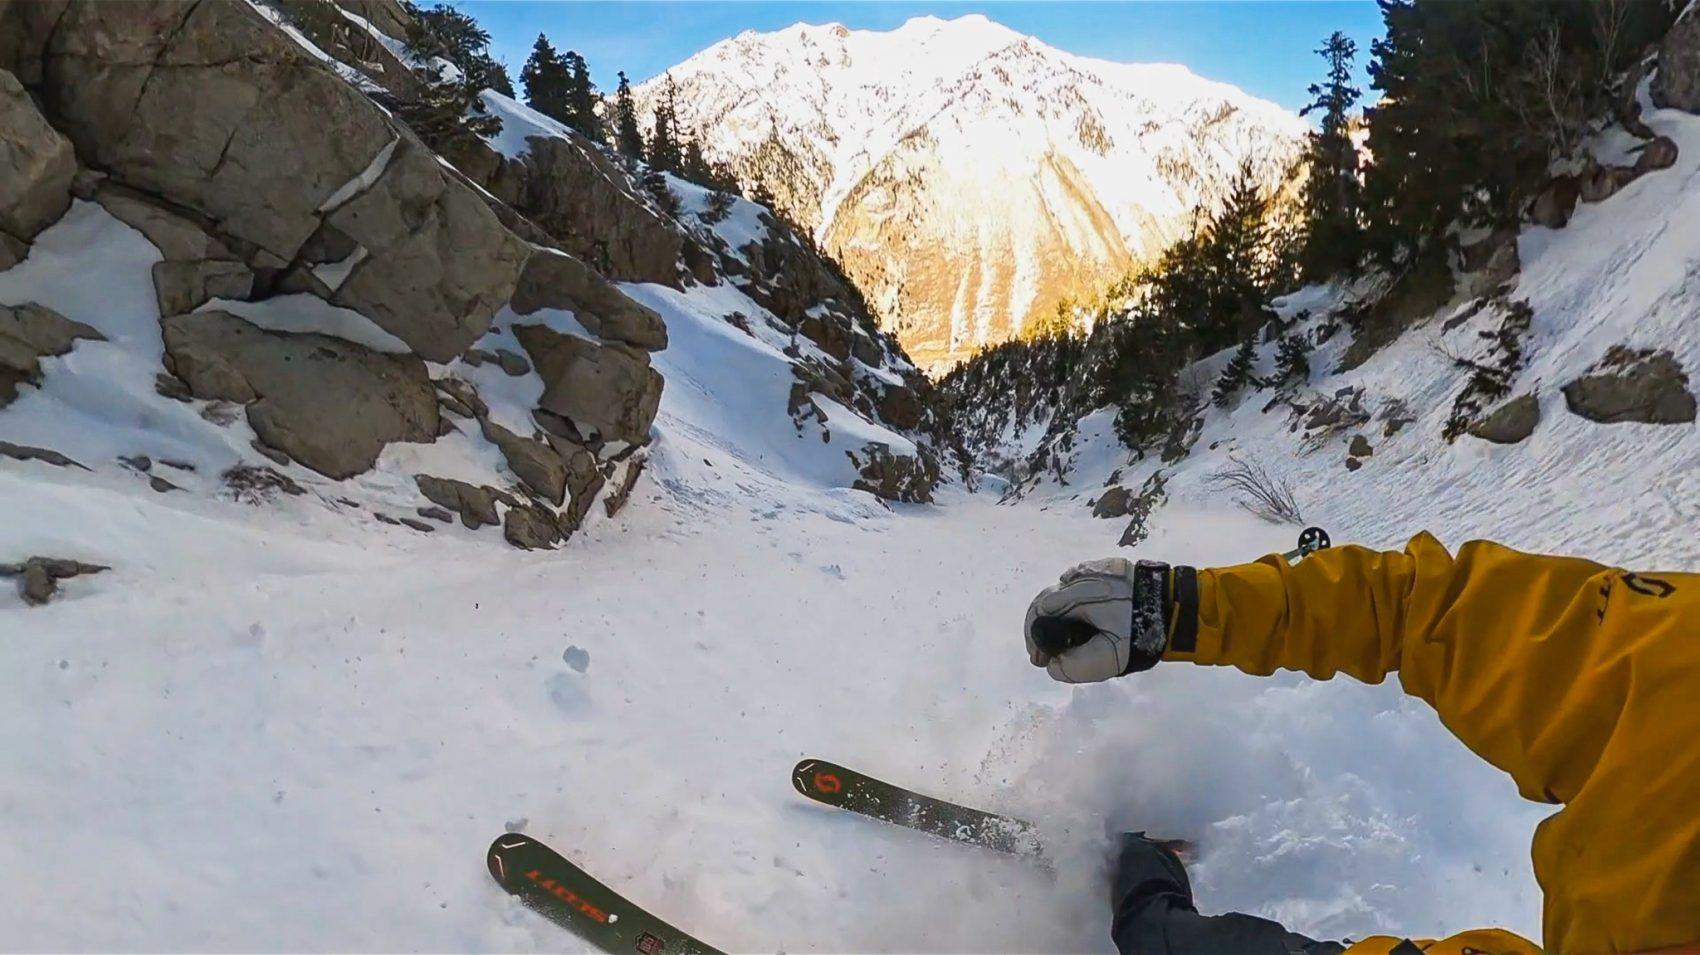 Lower chute fun. image: snowbrains